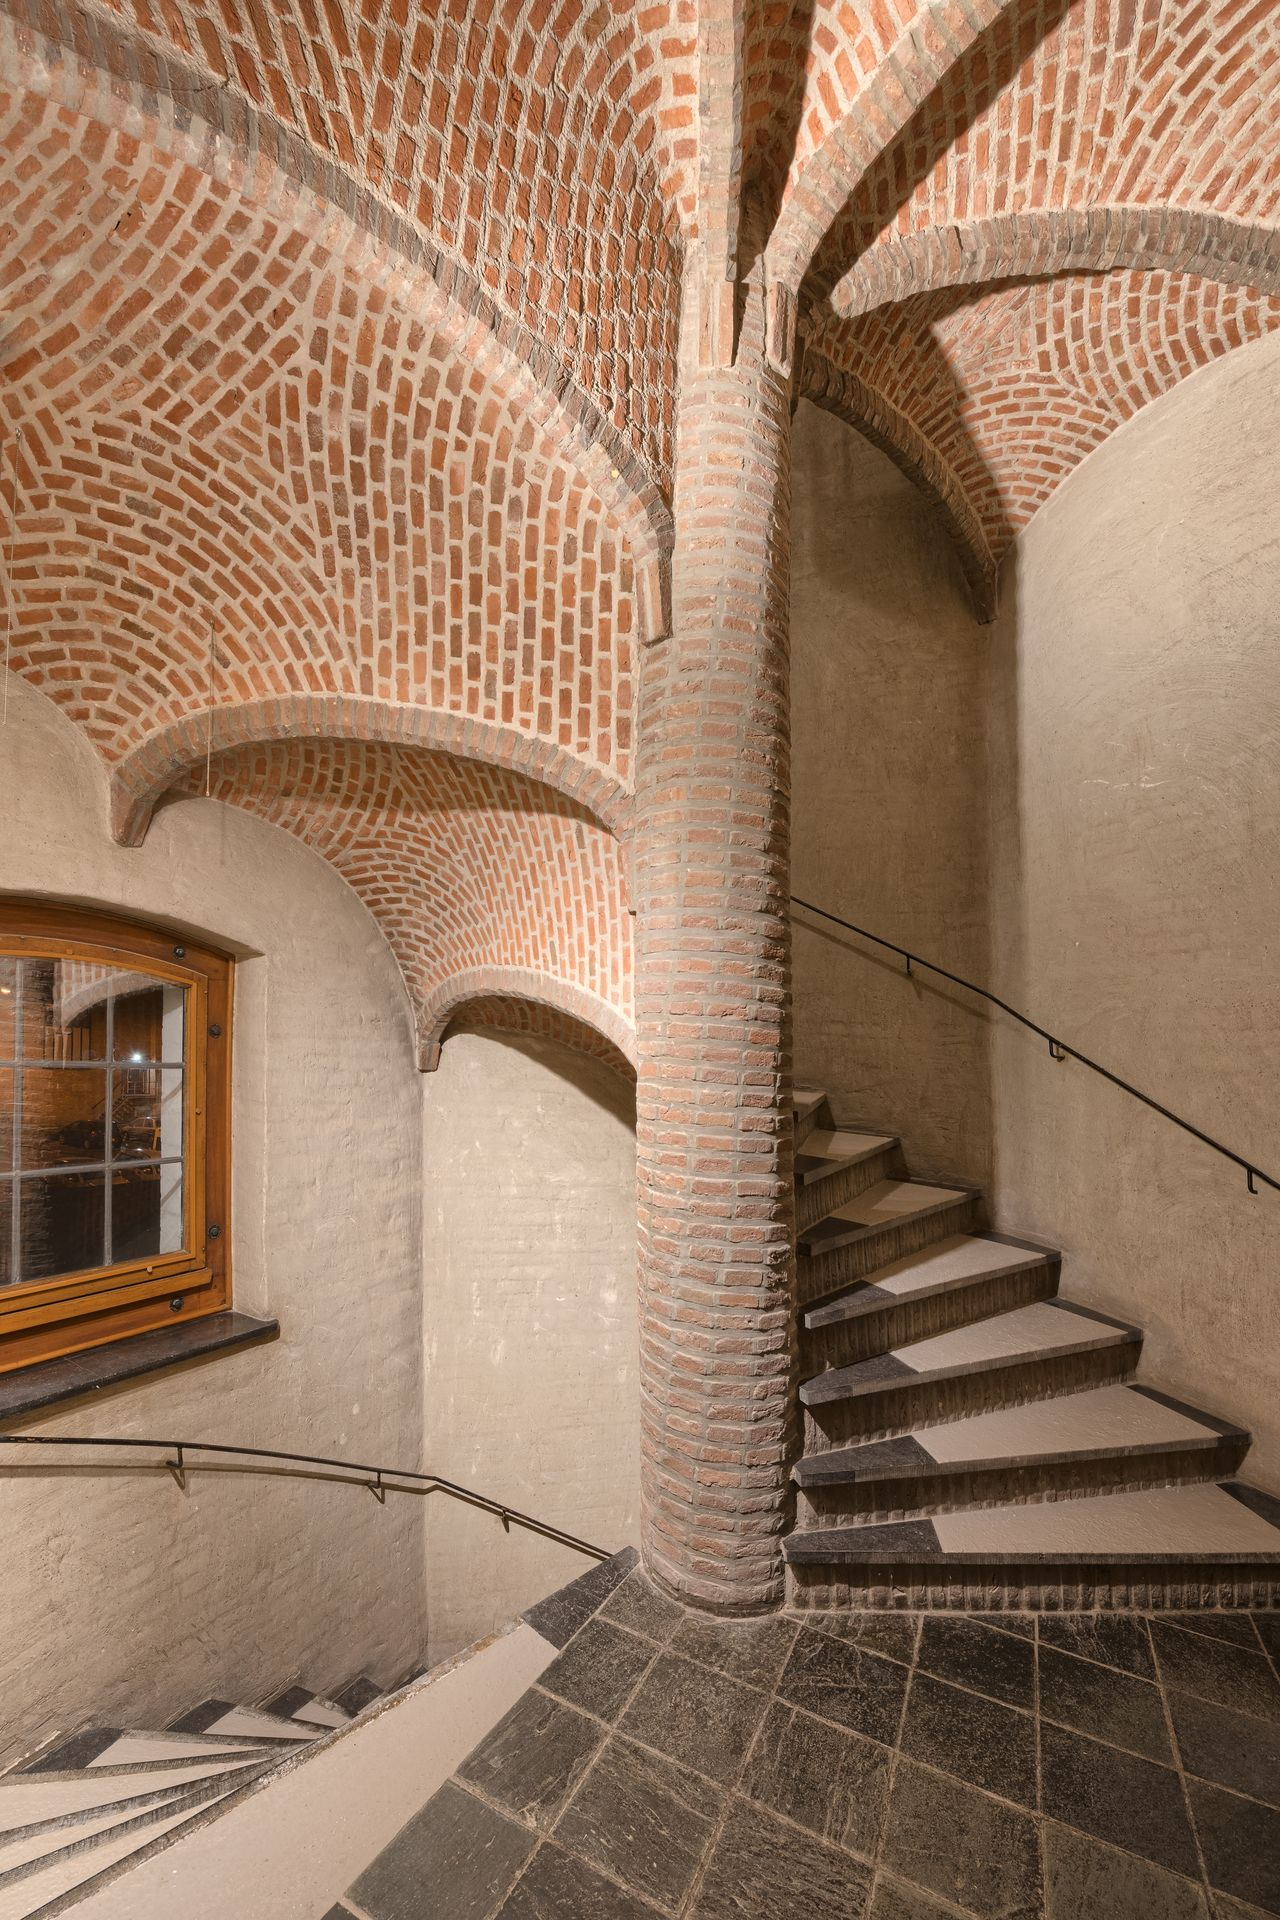 tranquilo-estida-hotel-the-roosevelt-middelburg-trappen